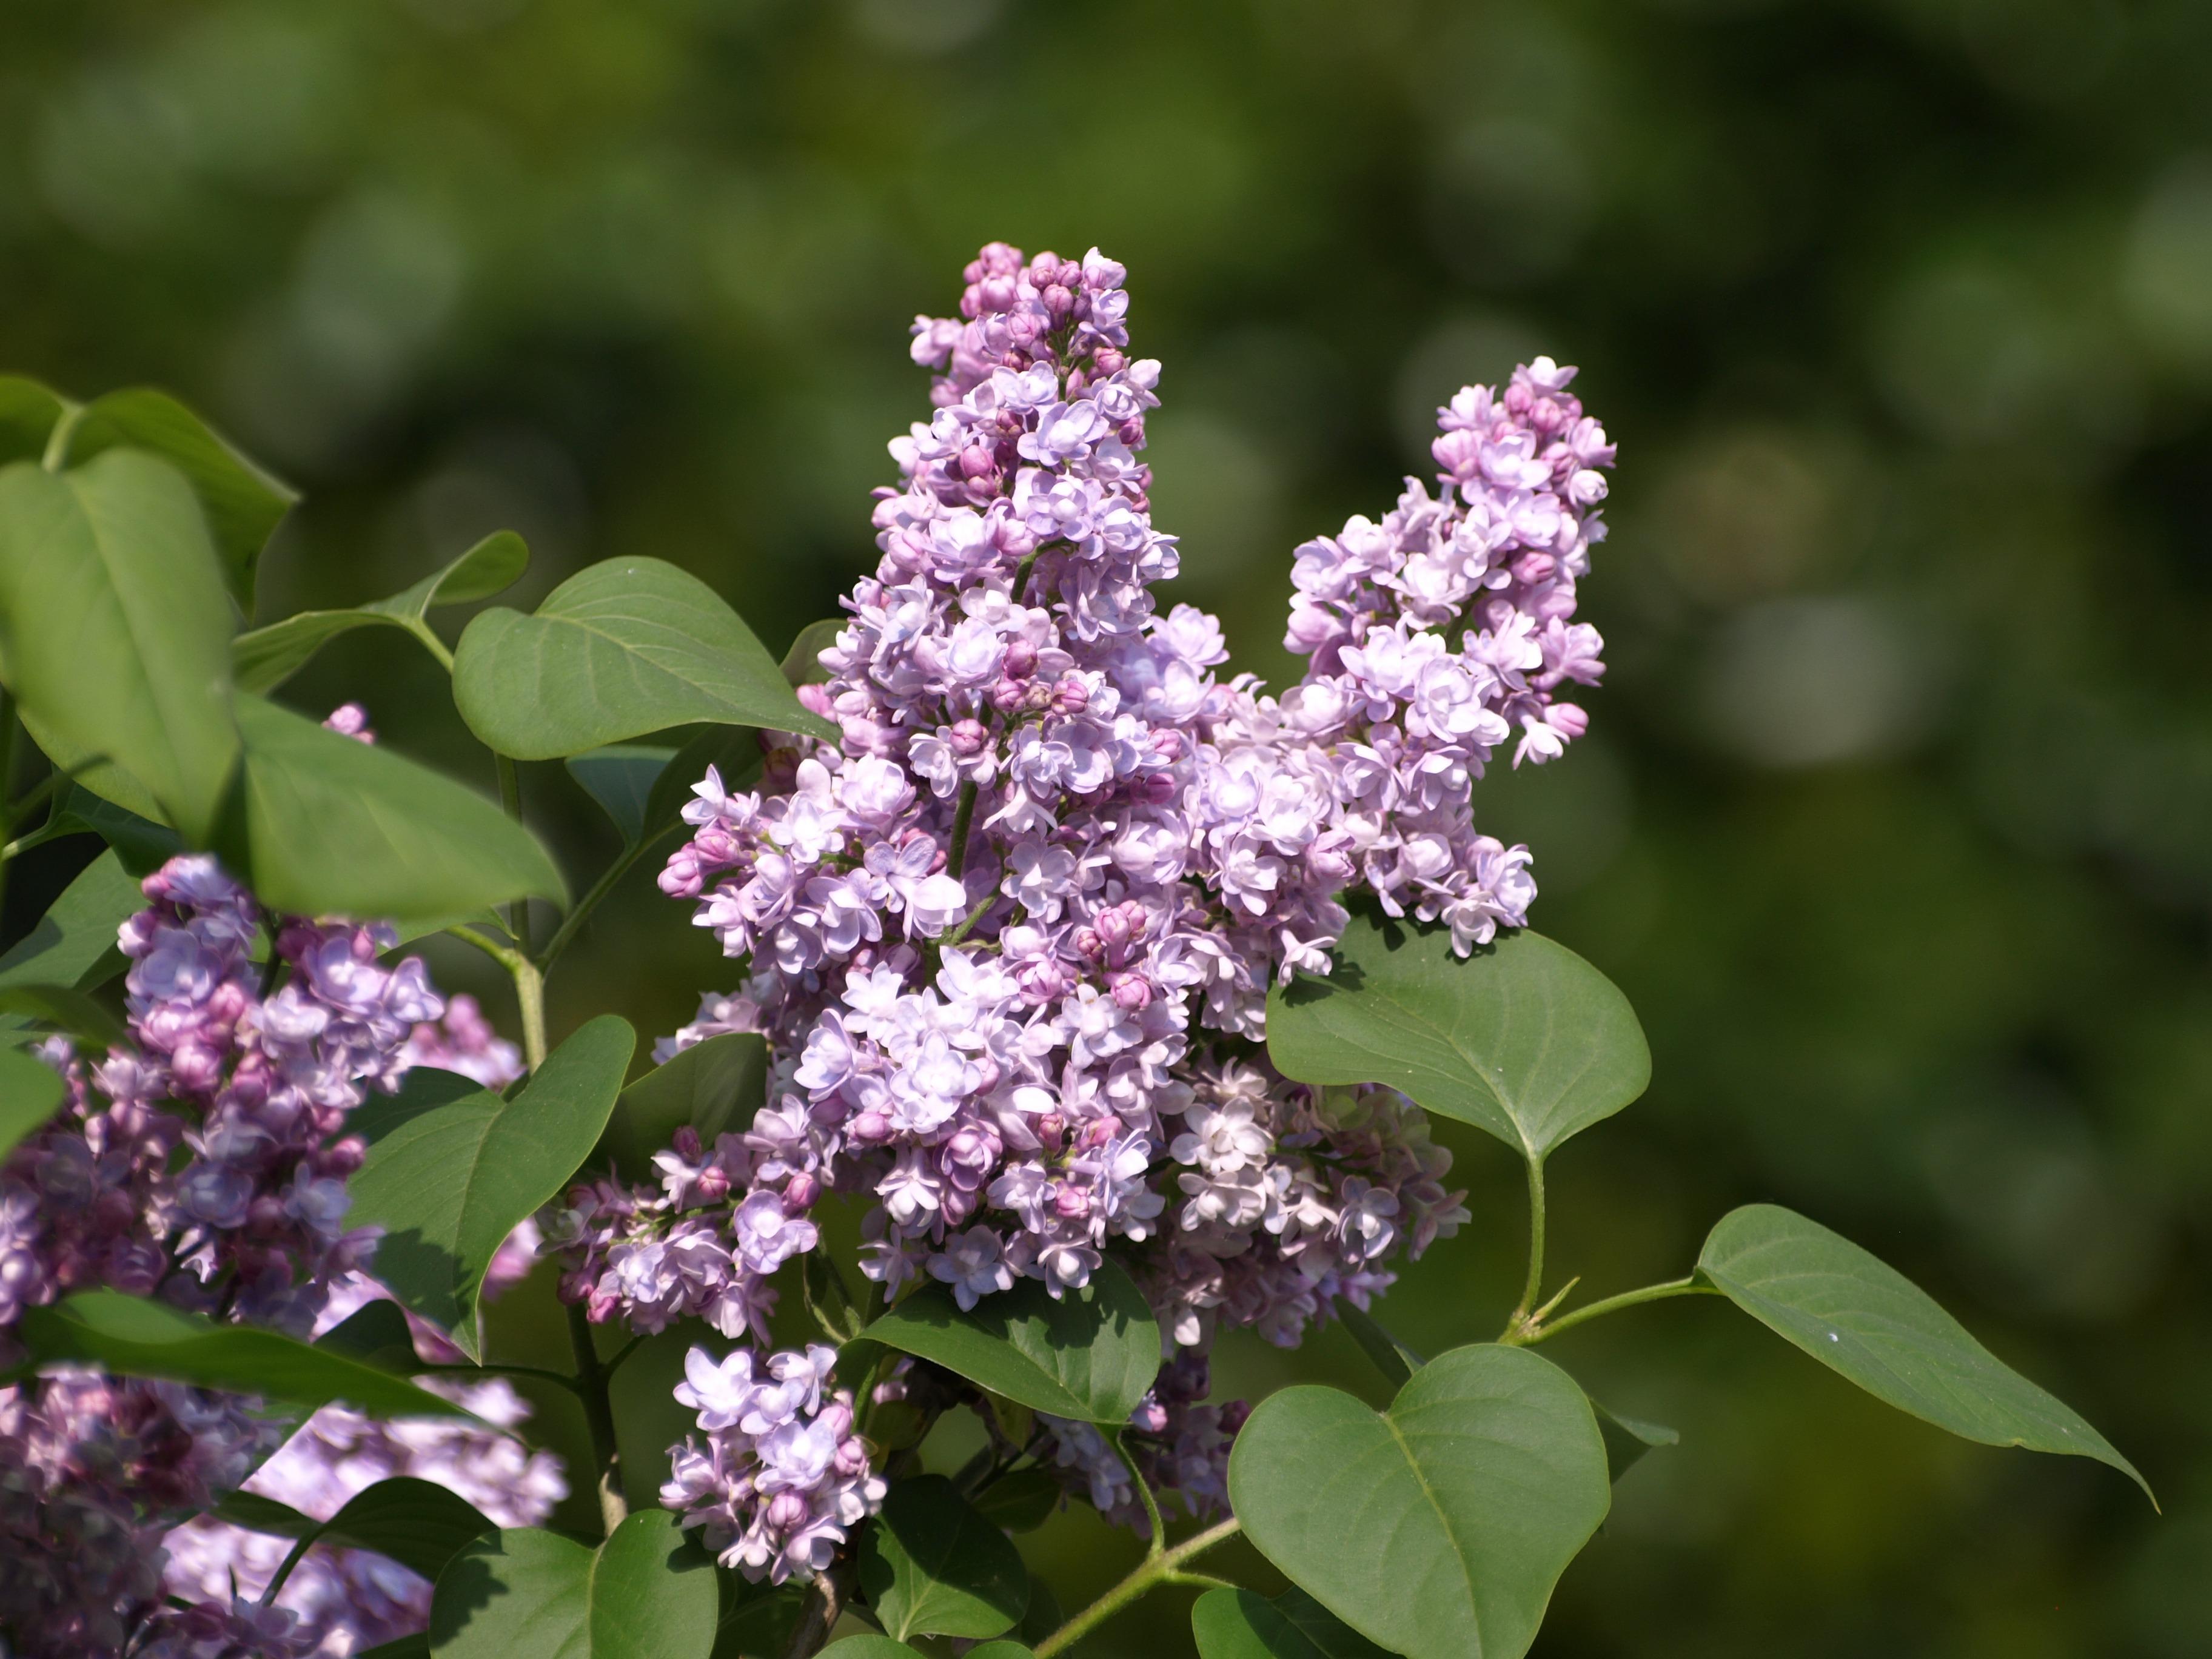 ramo flor plantar flor roxa erva botnica flora flores silvestres flores arbusto lils flor lils planta